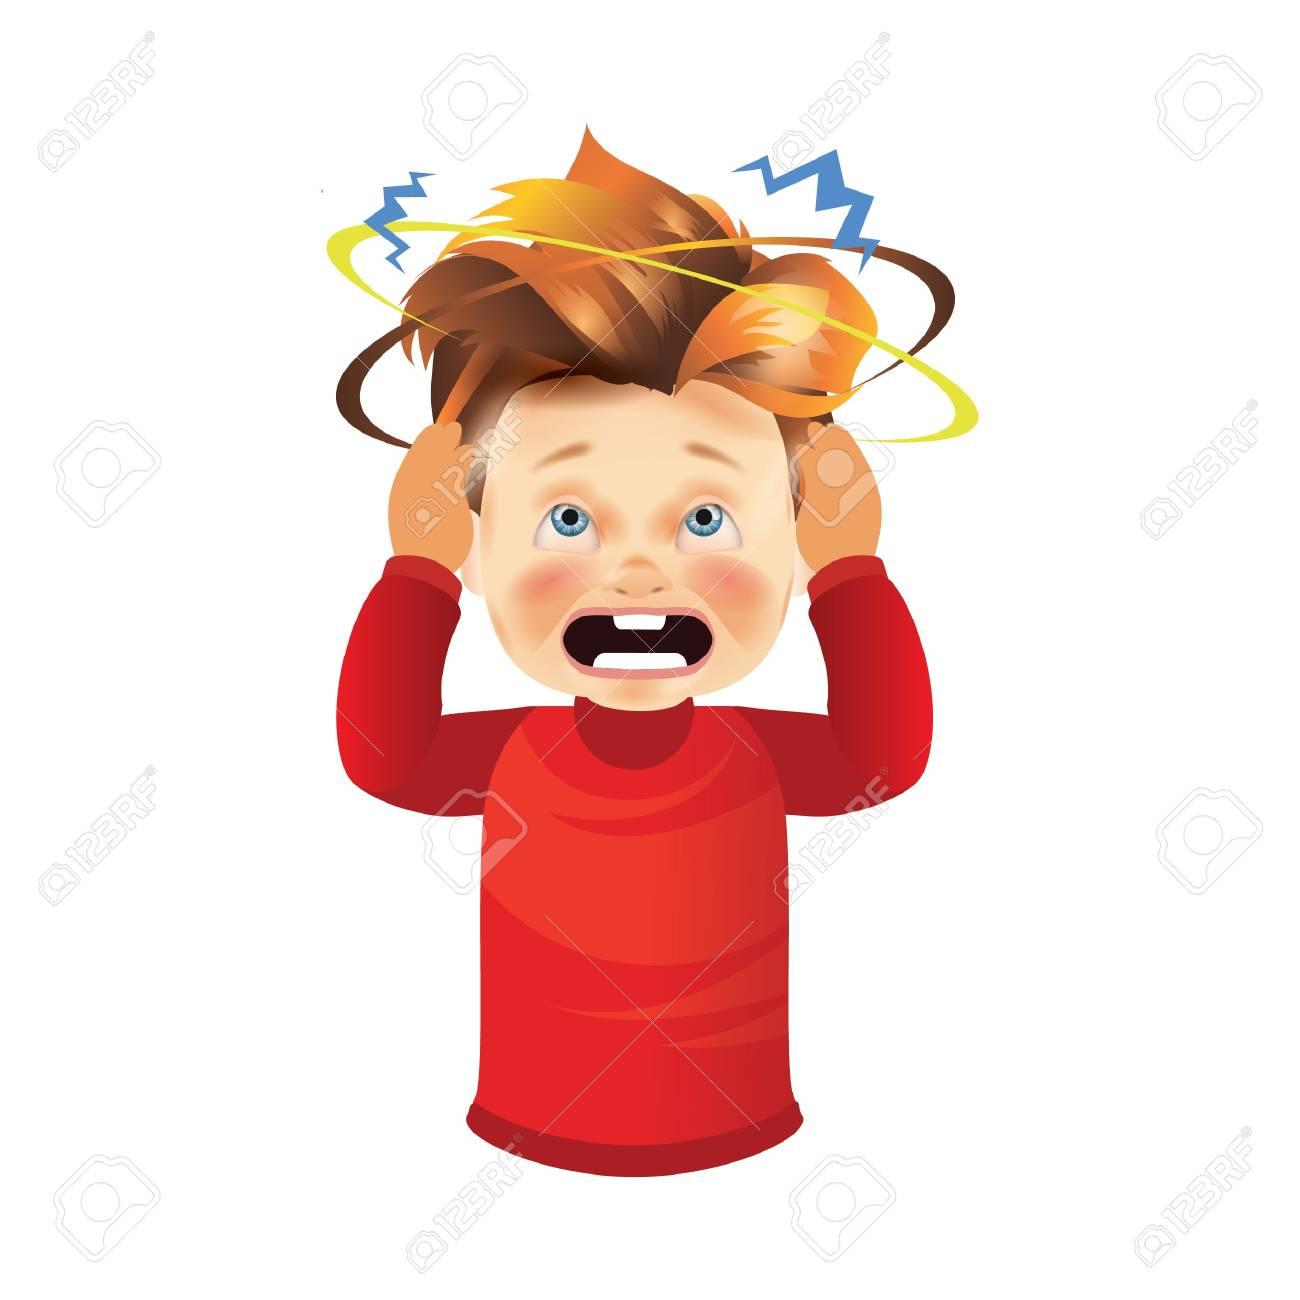 boy with headache - 79213366